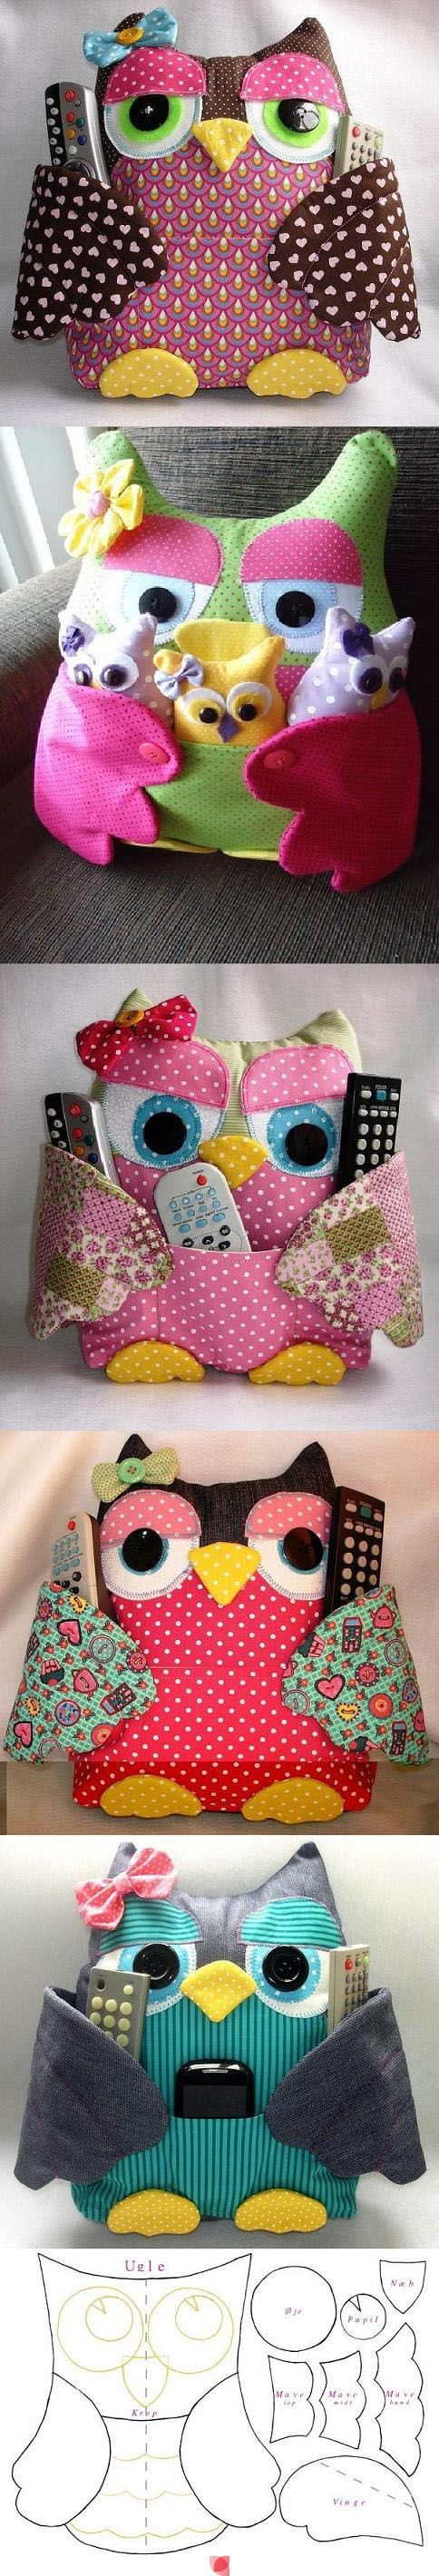 Owl Organizer Pillow.